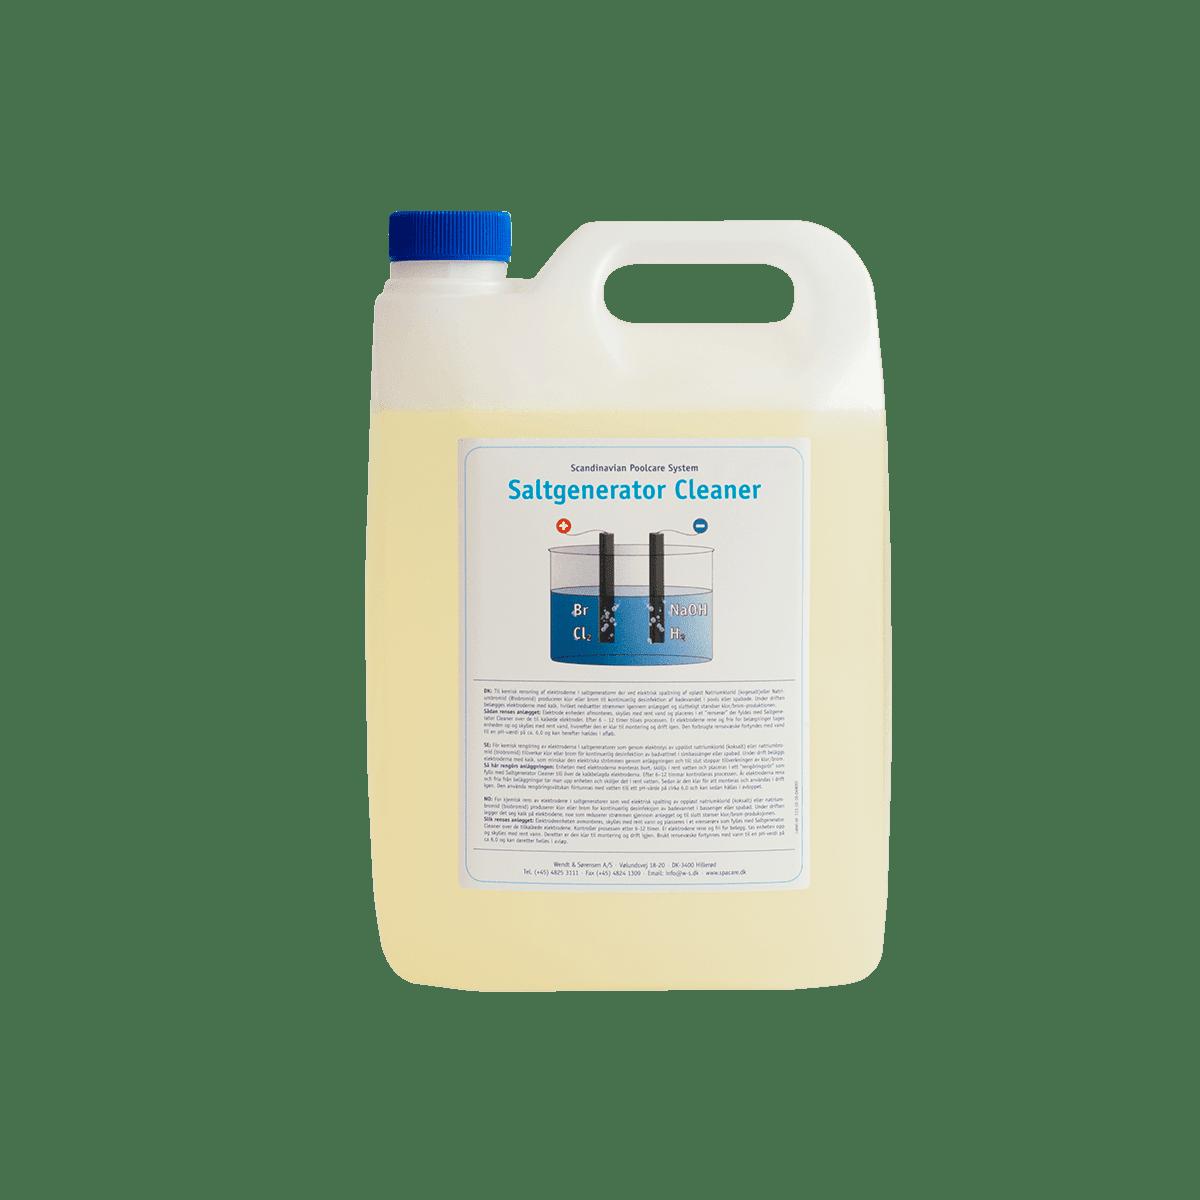 Saltgenerator Cleaner